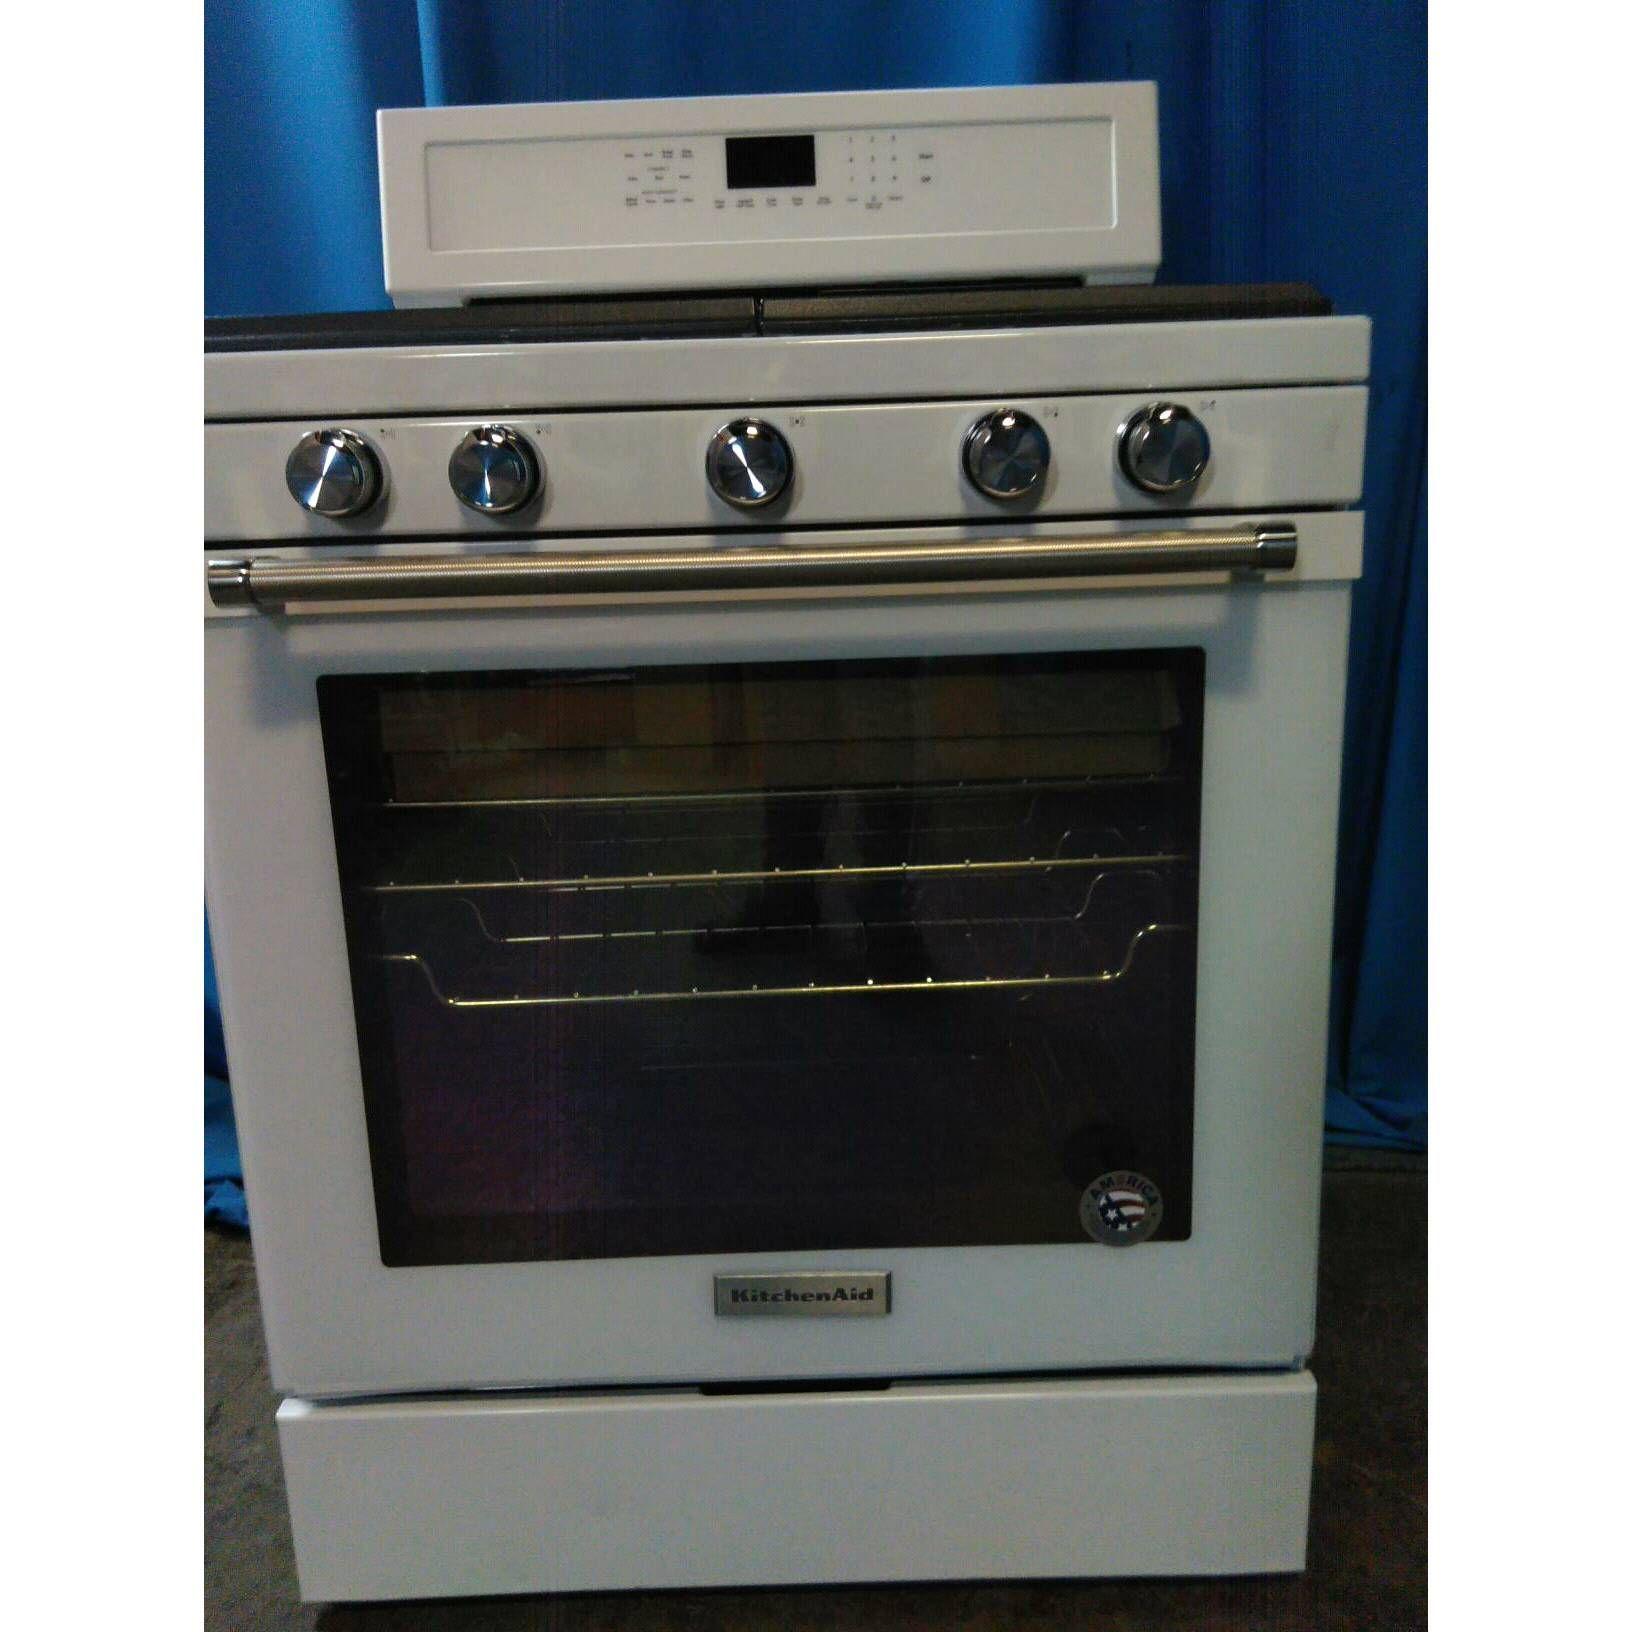 Sears Outlet: Discount appliances, refrigerators ...